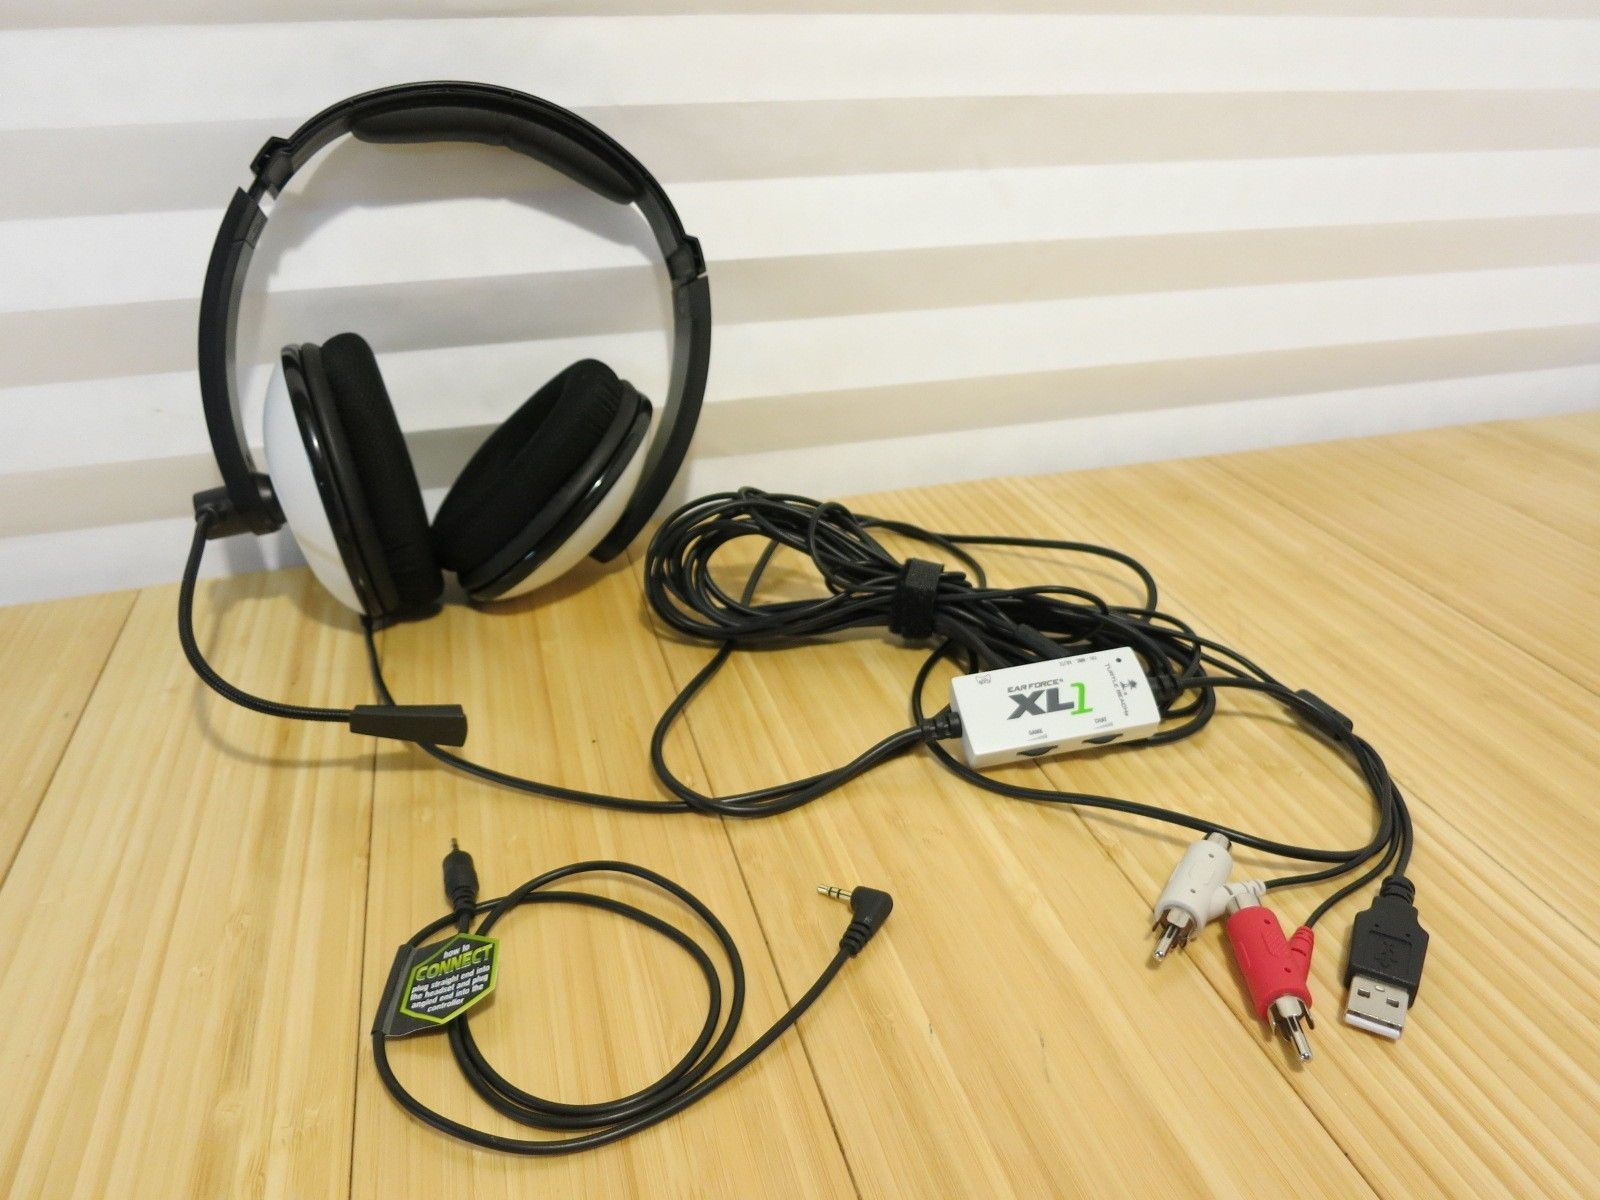 c1fd8baf85c 57. 57. Previous. Turtle Beach Ear Force XL1 Black/White Headband Headset  for Microsoft Xbox 360